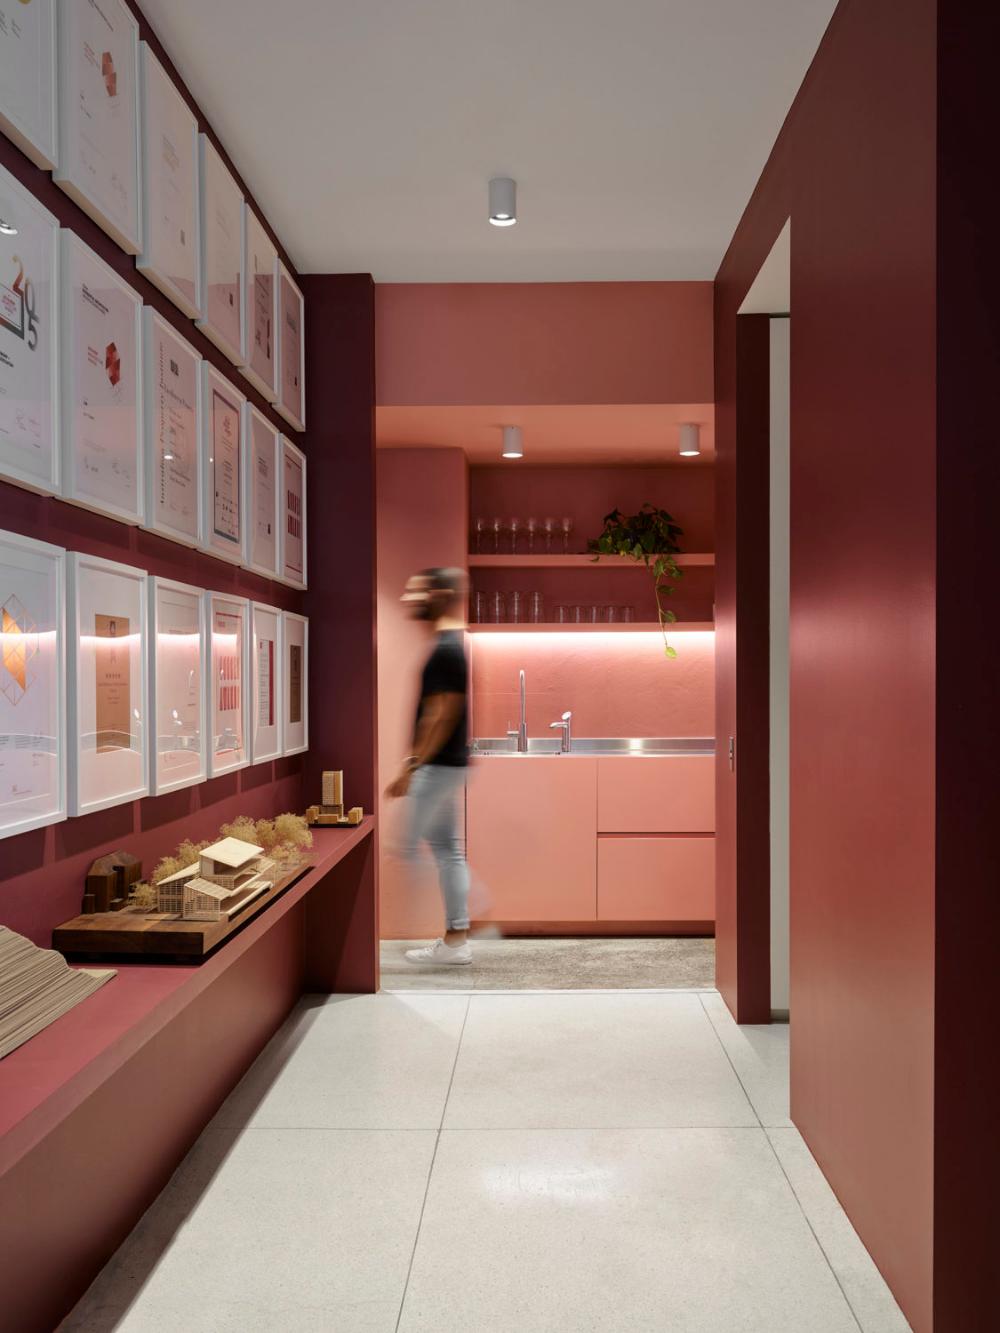 Office Room Design Software: SJB Sydney Studio Refurbishment In Surry Hills